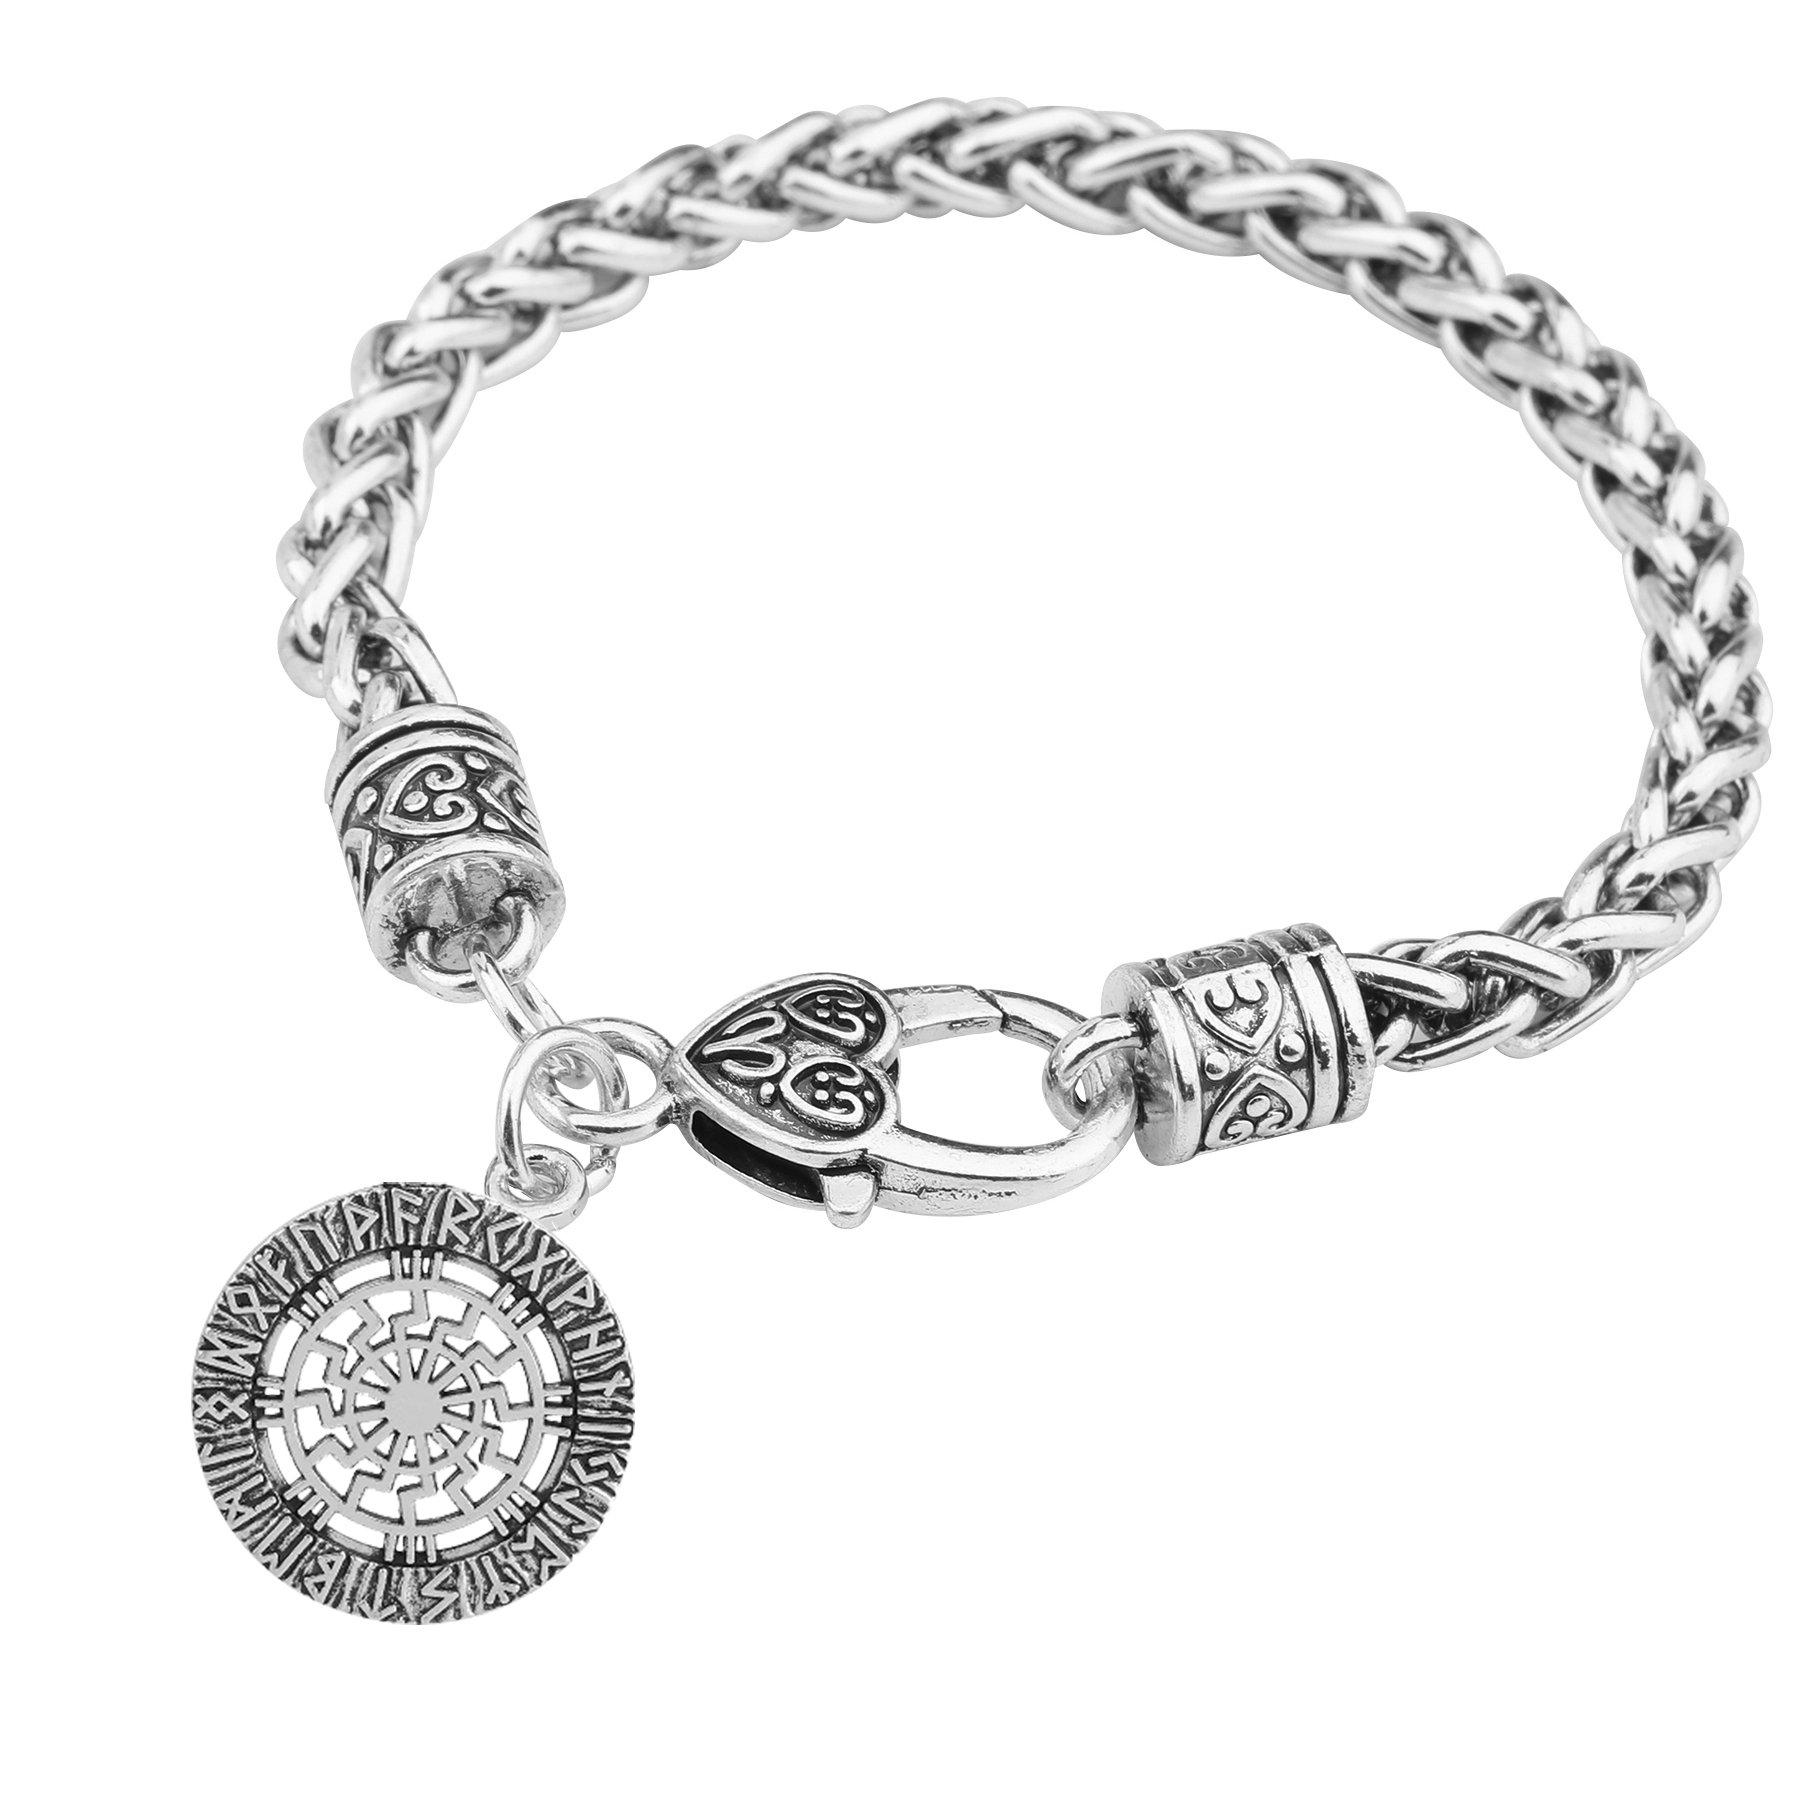 TEAMER Slavic Sun Wheel Pendant Viking Runes Jewelry Valkyrie Vintage Bracelets Charm Bracelets